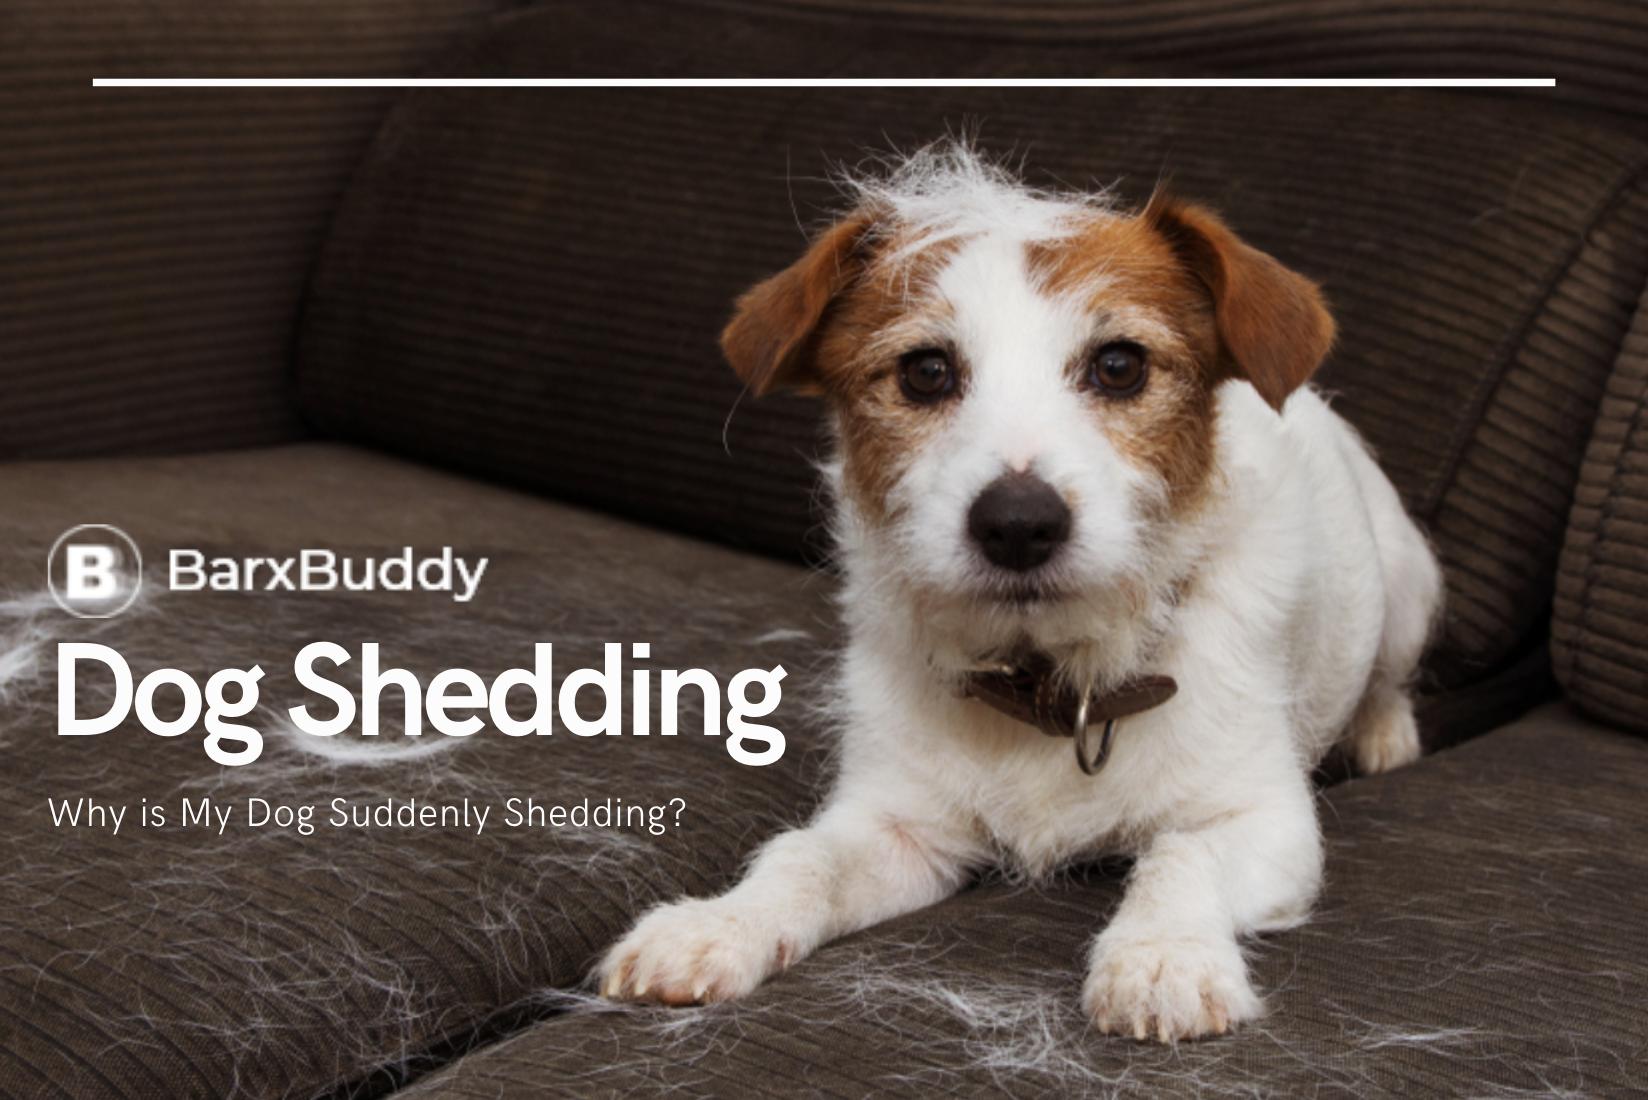 Dog Shedding Tips from BarxBuddy